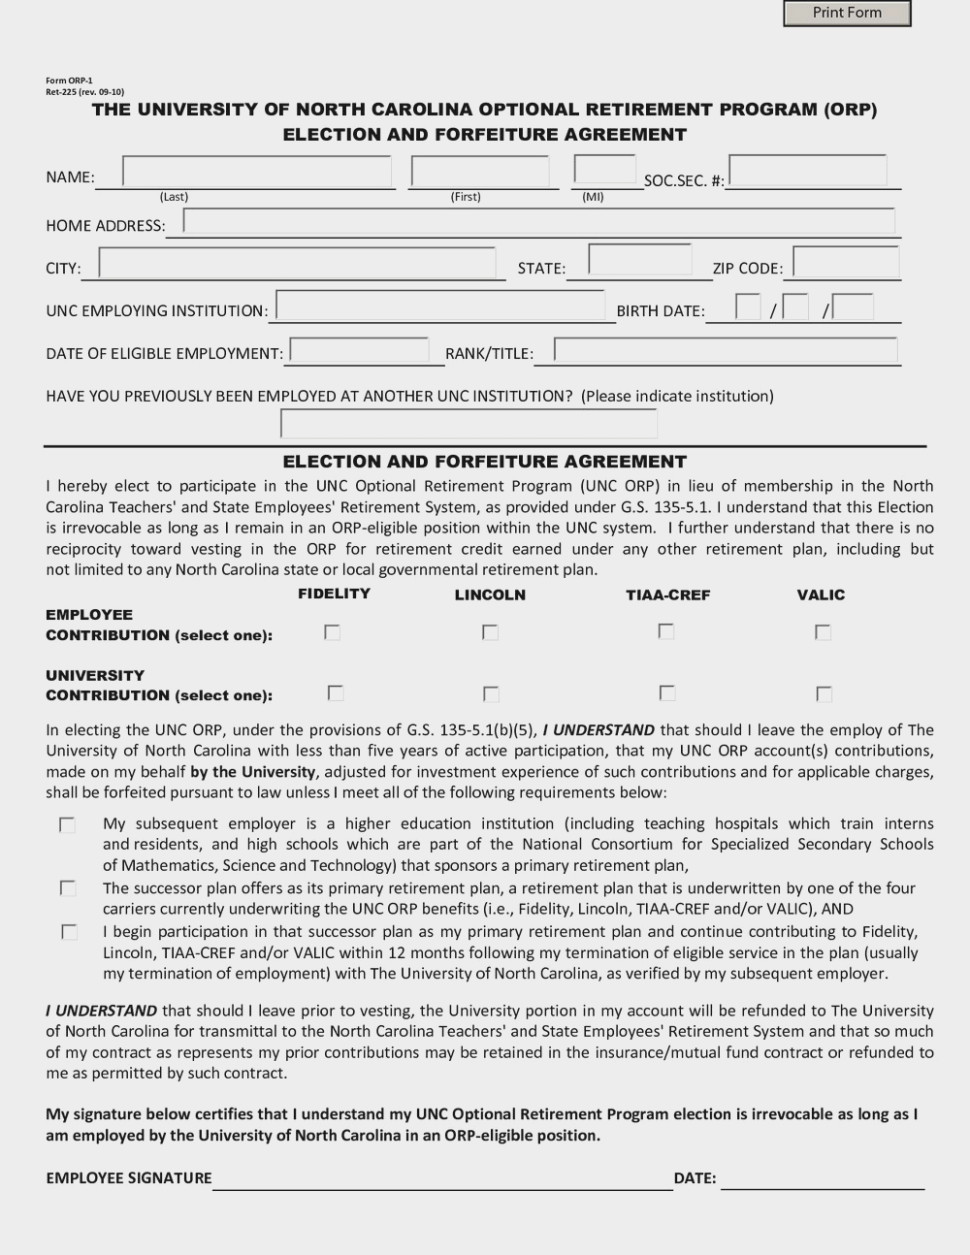 Pennsylvania Divorce Filing Fees